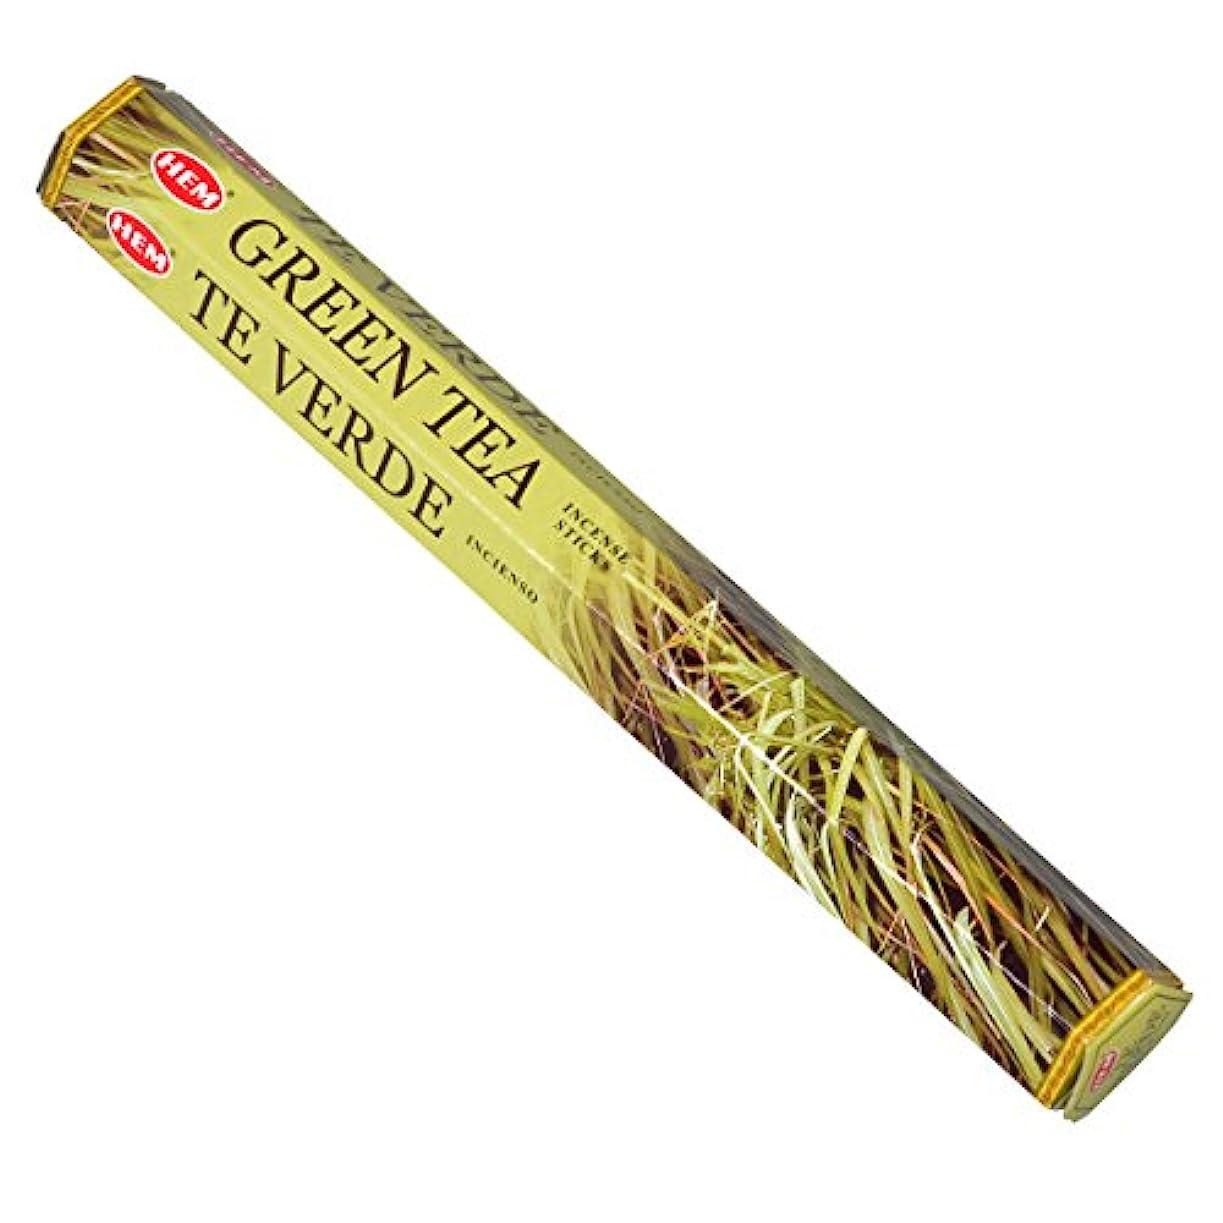 HEM(ヘム) グリーン ティー GREEN TEA スティックタイプ お香 1筒 単品 [並行輸入品]